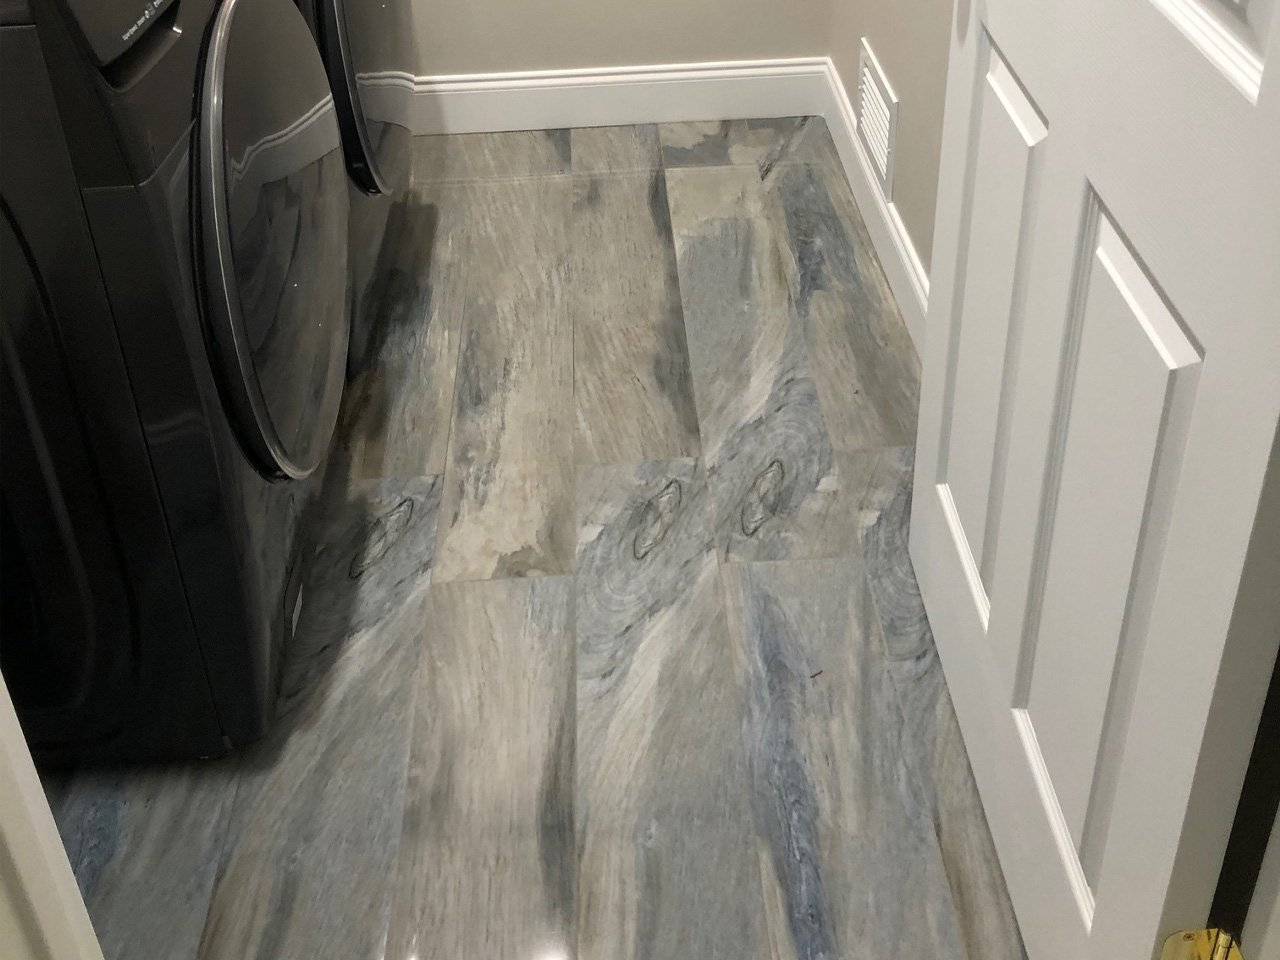 Basking-Ridge-Laundry-Room-Tile-After